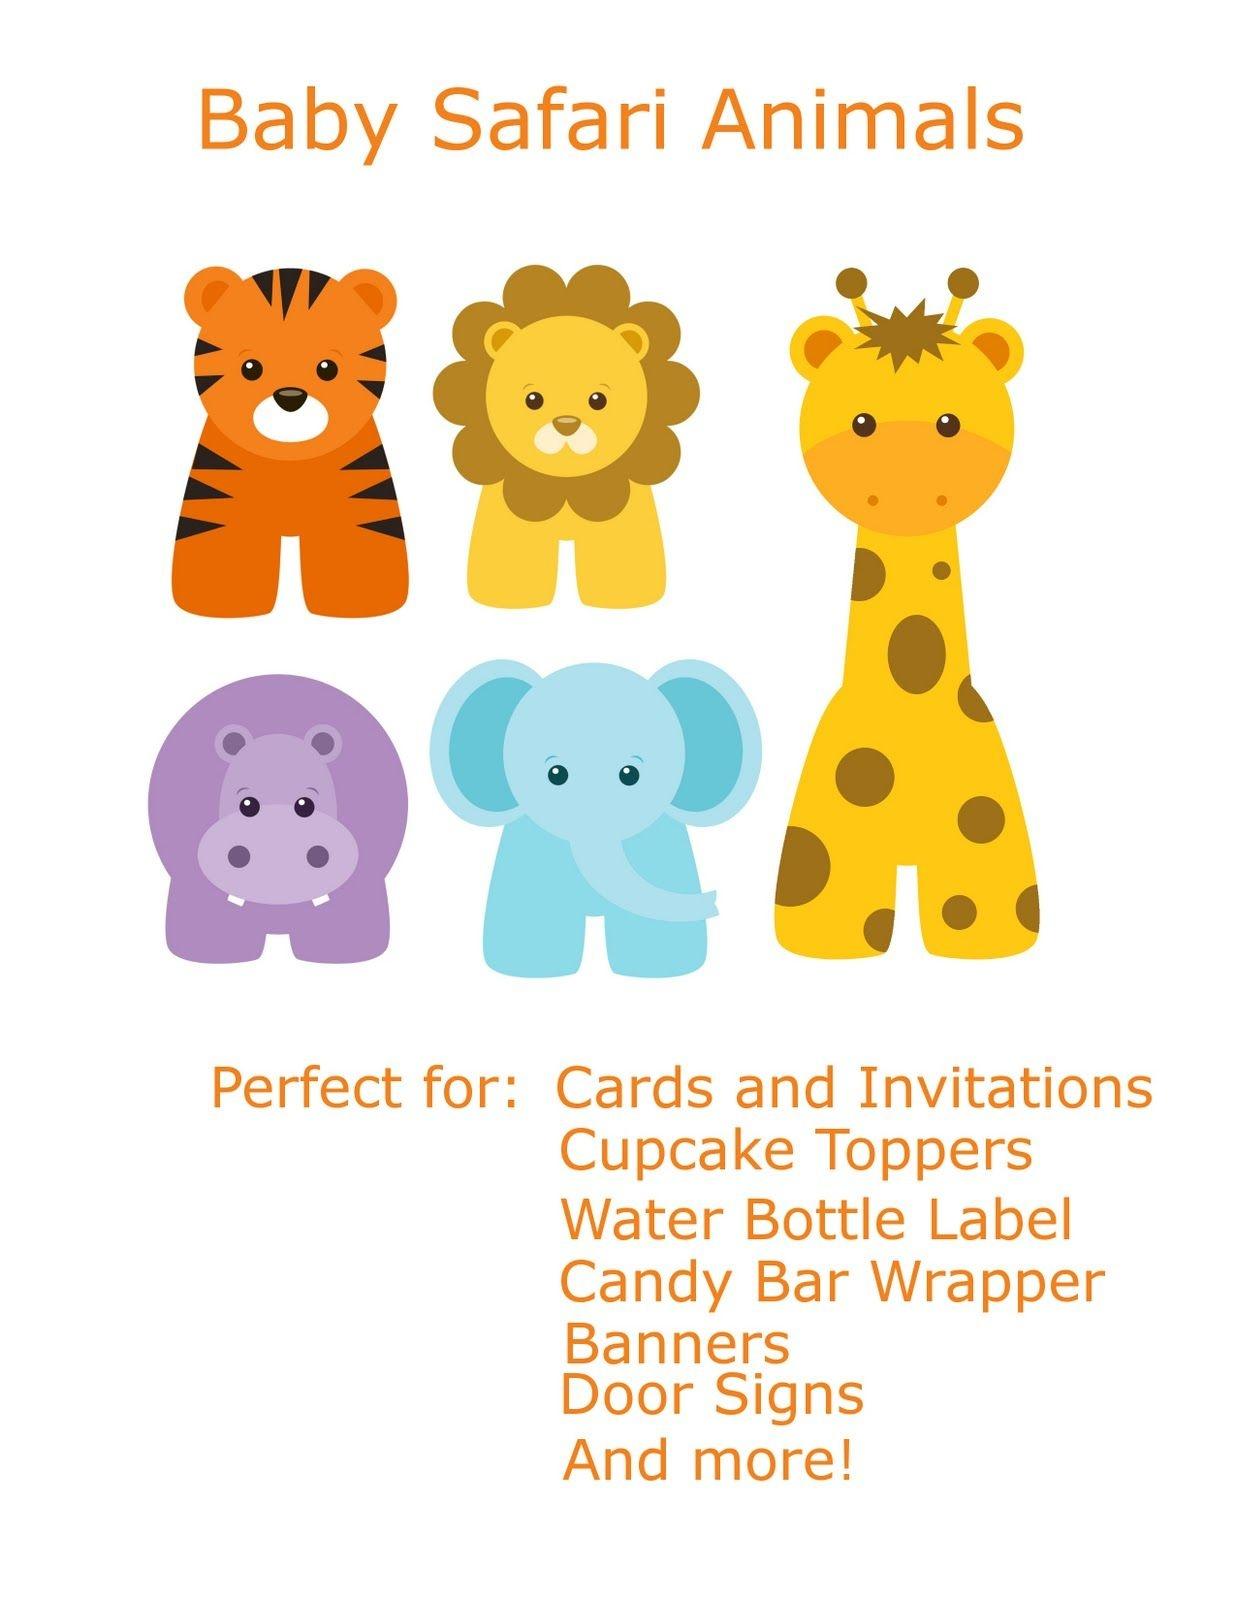 Free Baby Animal Clip Art | Paper Parties: Baby Safari Clip Art - Free Printable Baby Jungle Animal Clipart